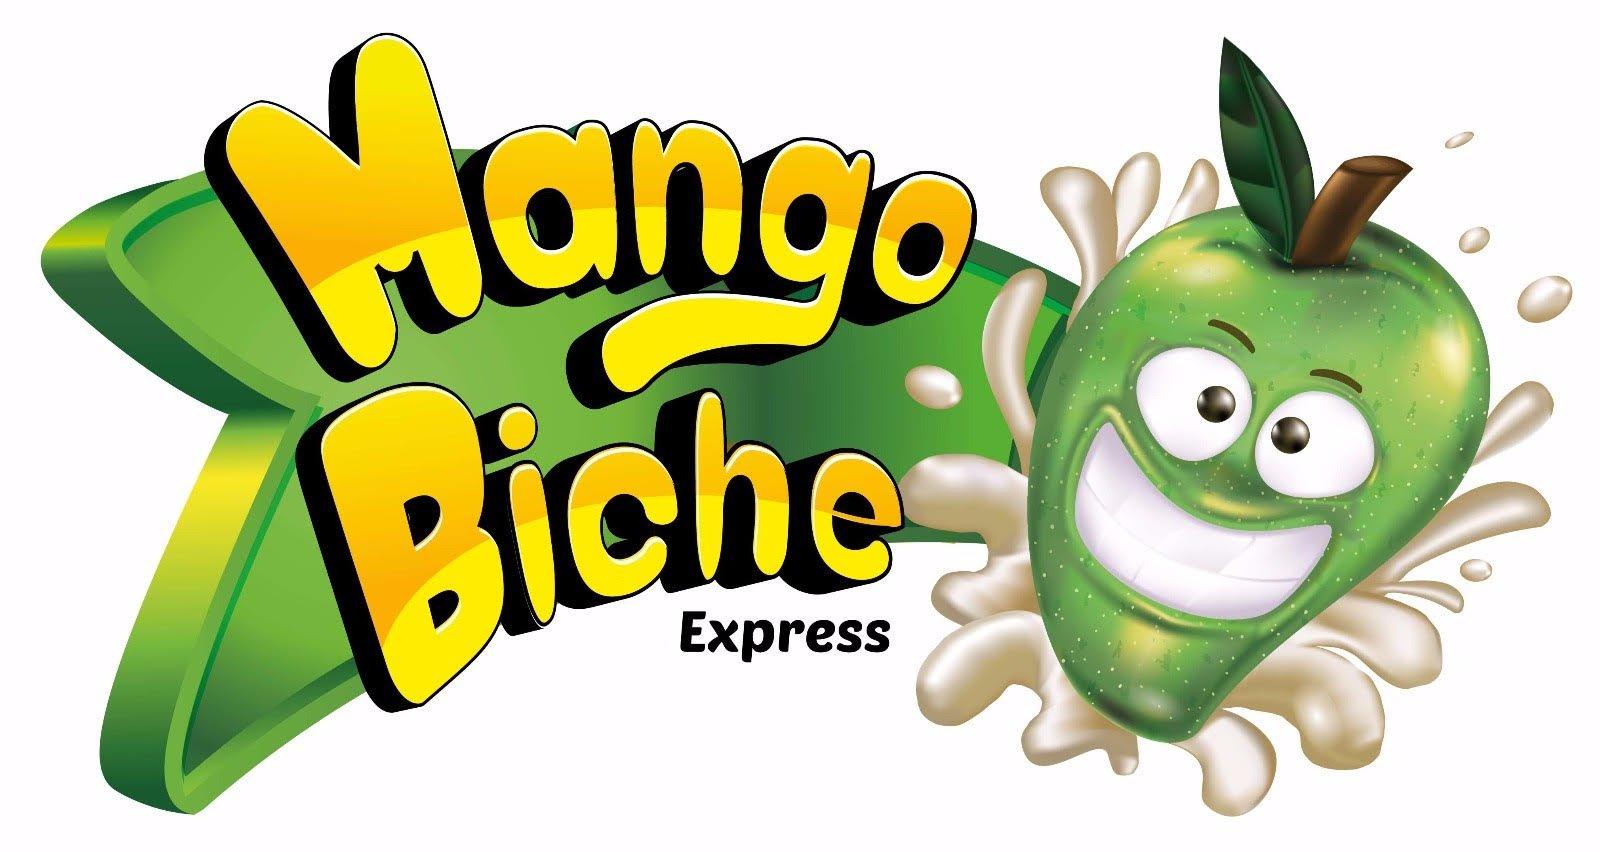 Mango Biche Express CC Viva Envigado